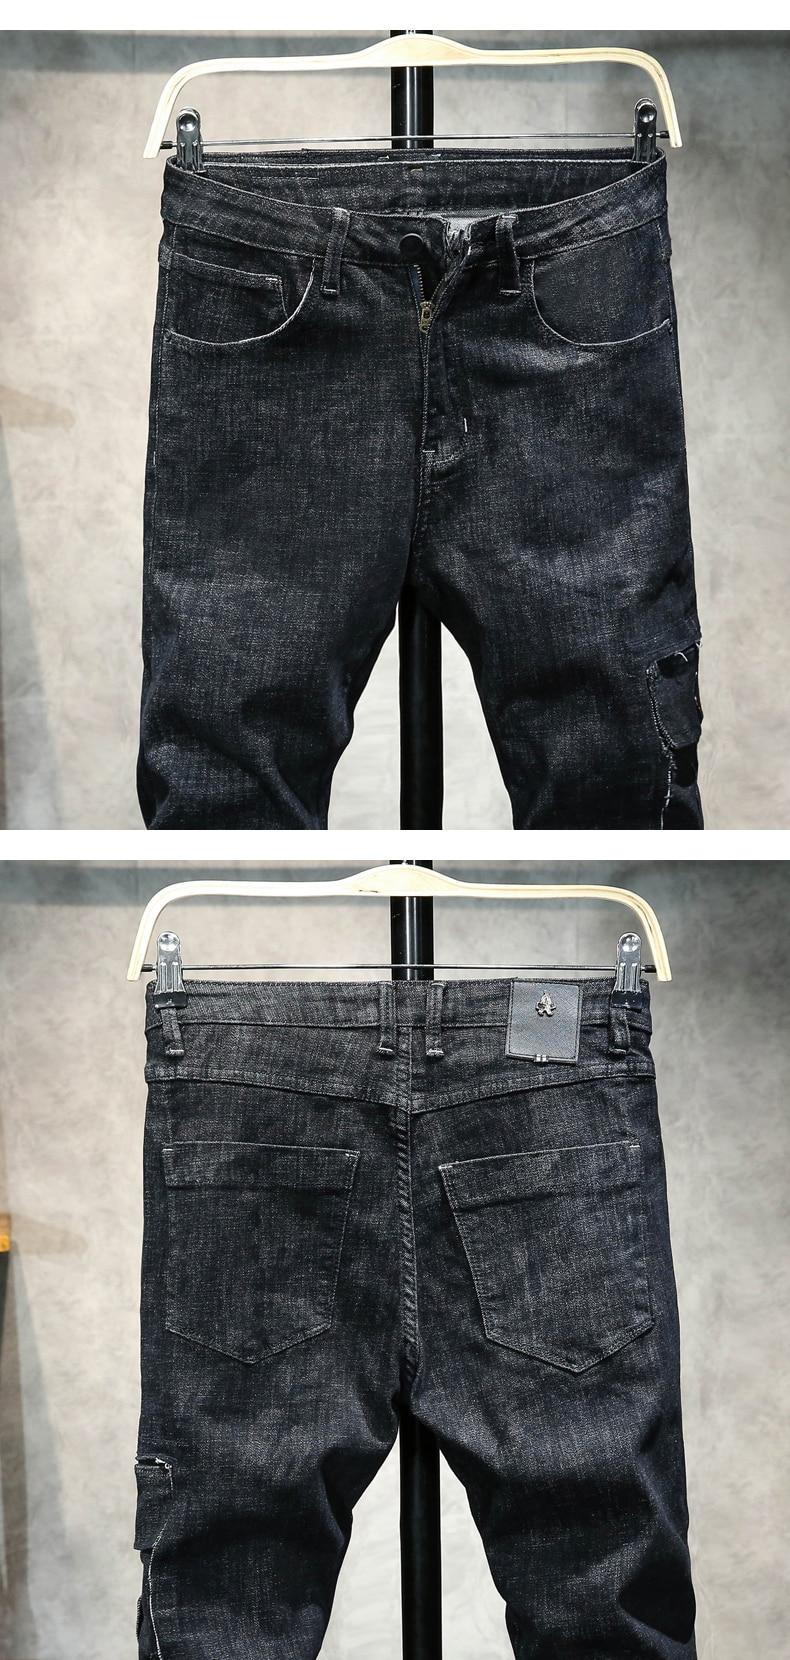 KSTUN Men's Jeans Fashion Brand 2018 Winter Black Pants Slim Skinny Tapered Male Moto Biker Jeans